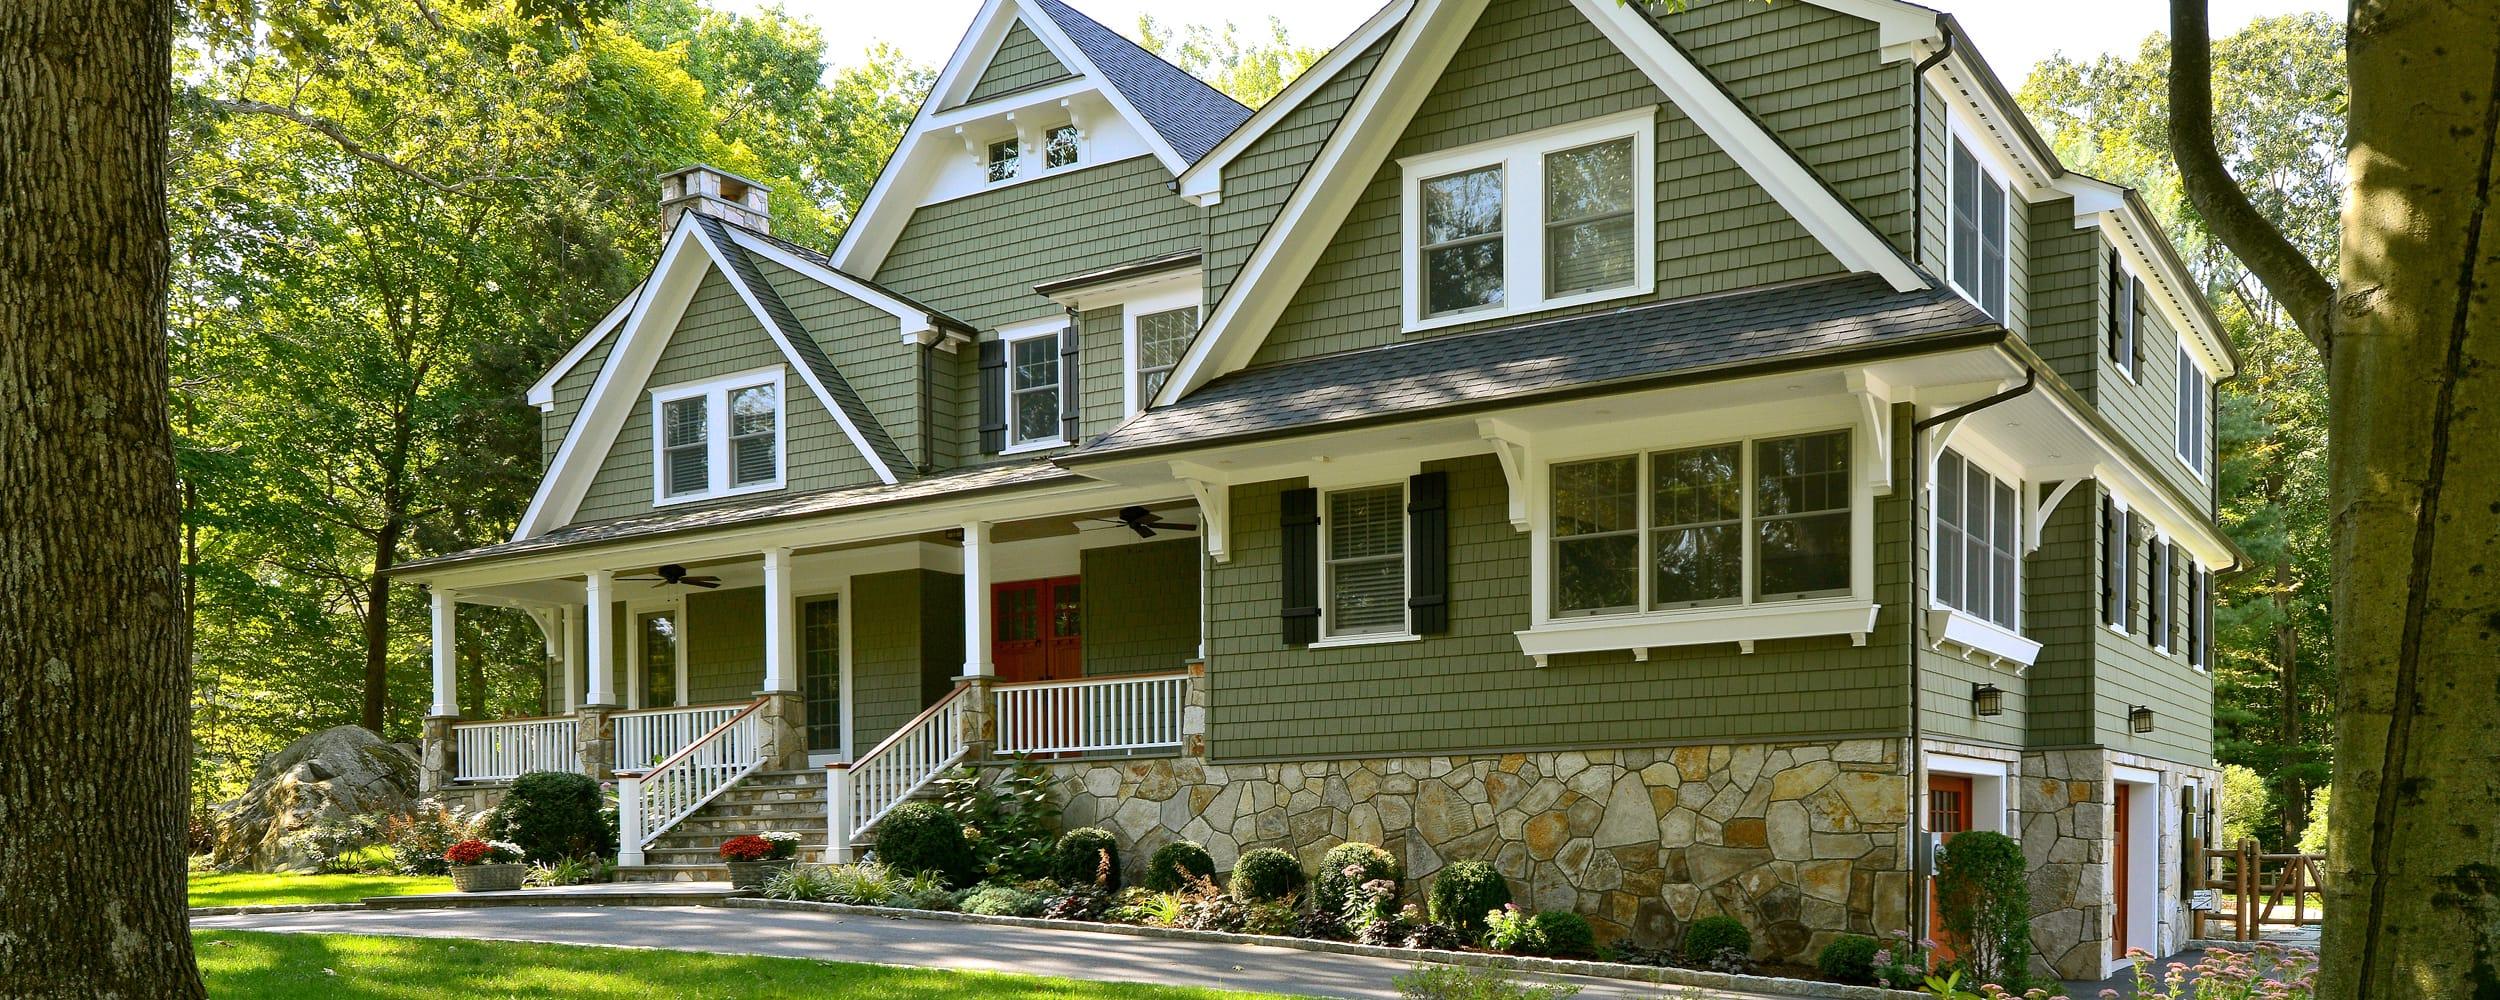 Durability Of Vinyl Siding Home Exterior Options Vsi